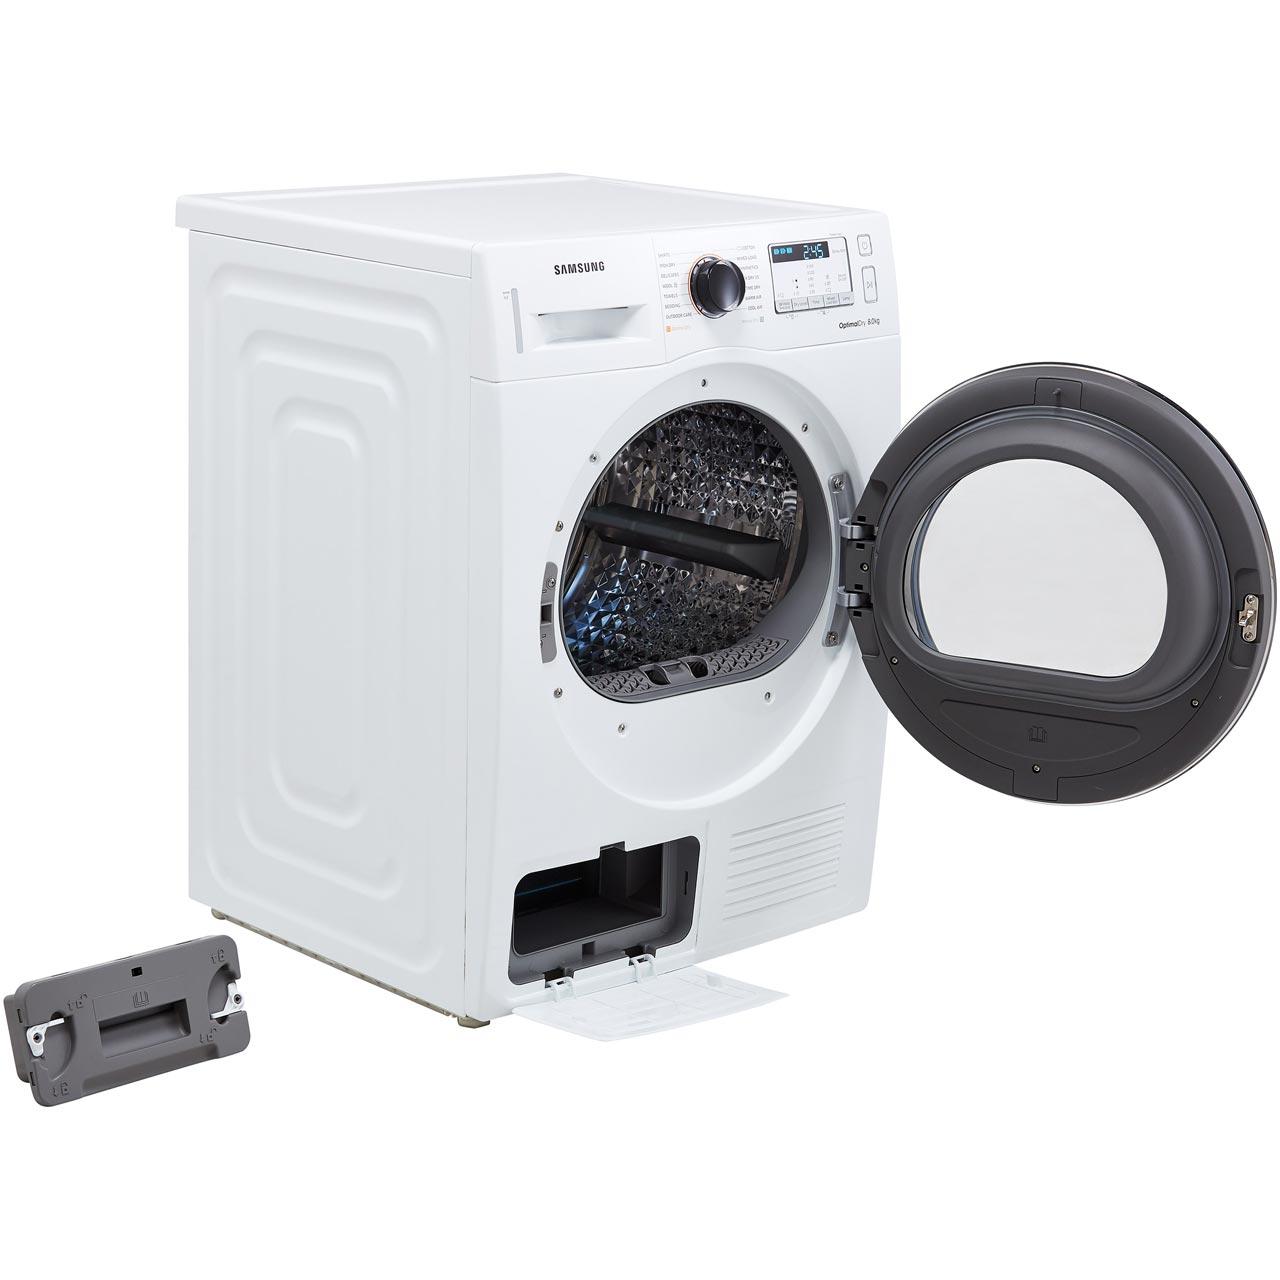 Samsung DV80M50133X 8Kg Heat Pump Tumble Dryer - Graphite - A++ Rated